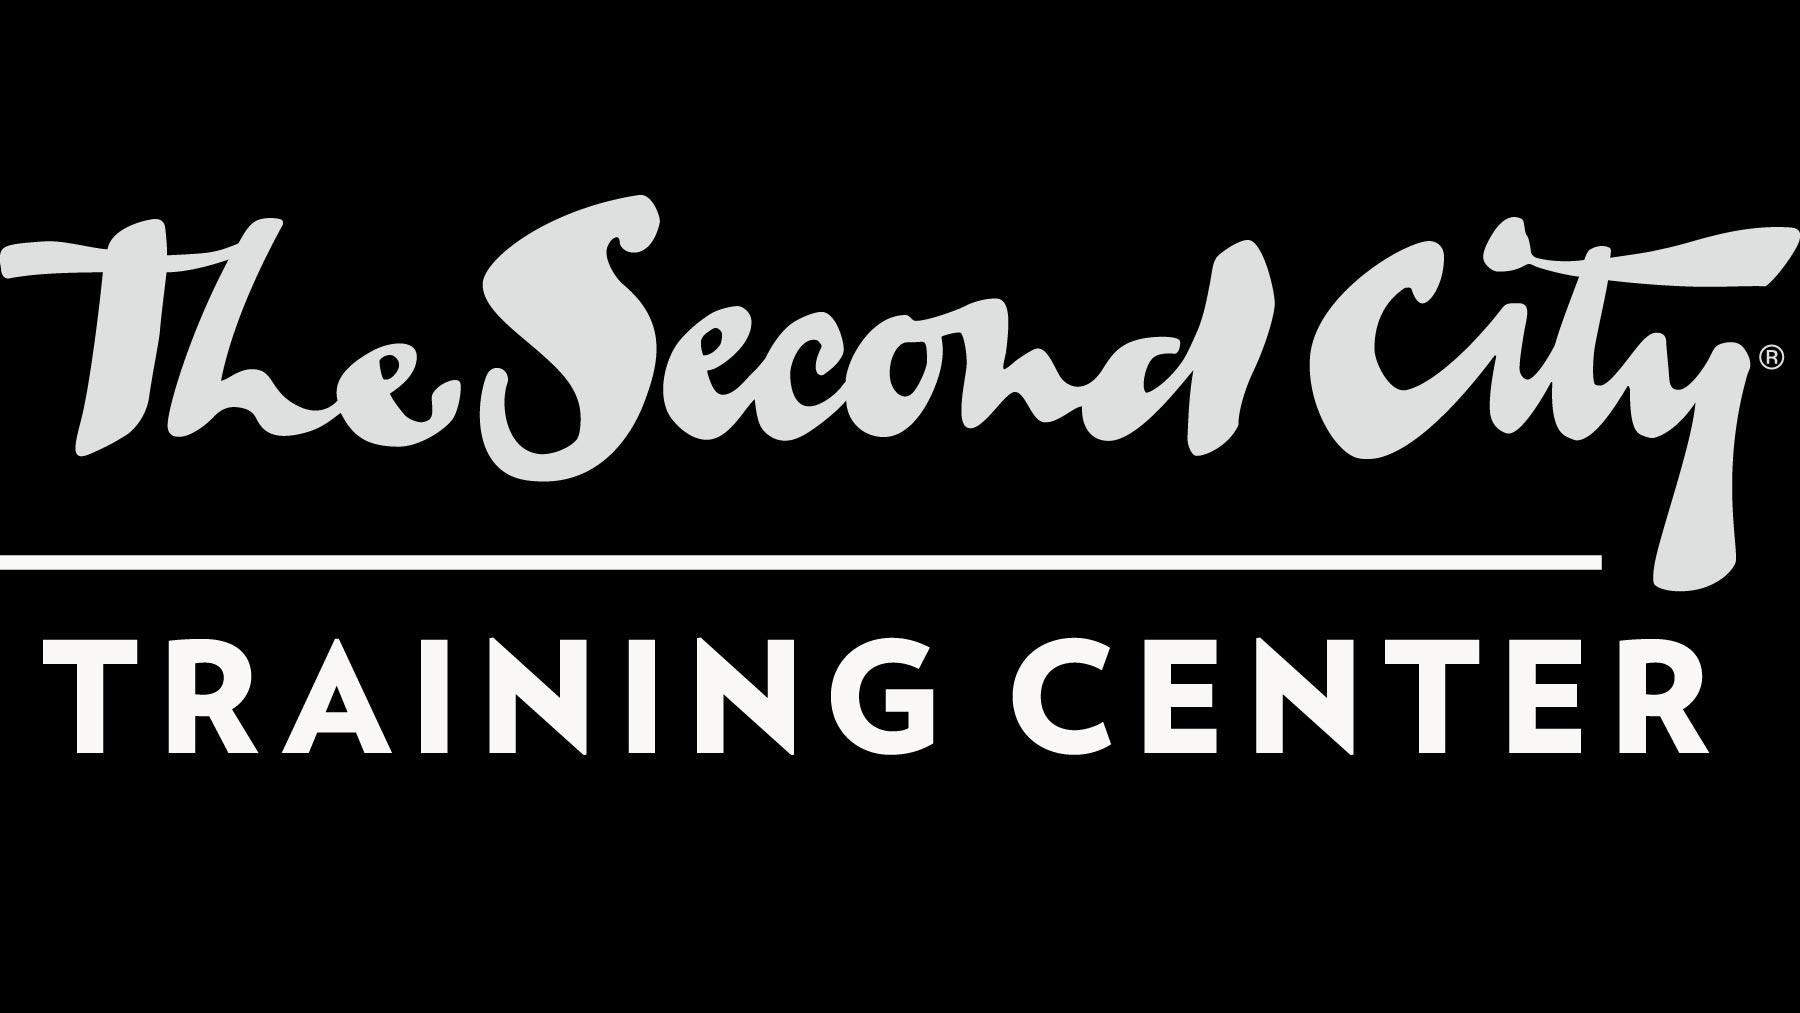 Black Training Center Logo